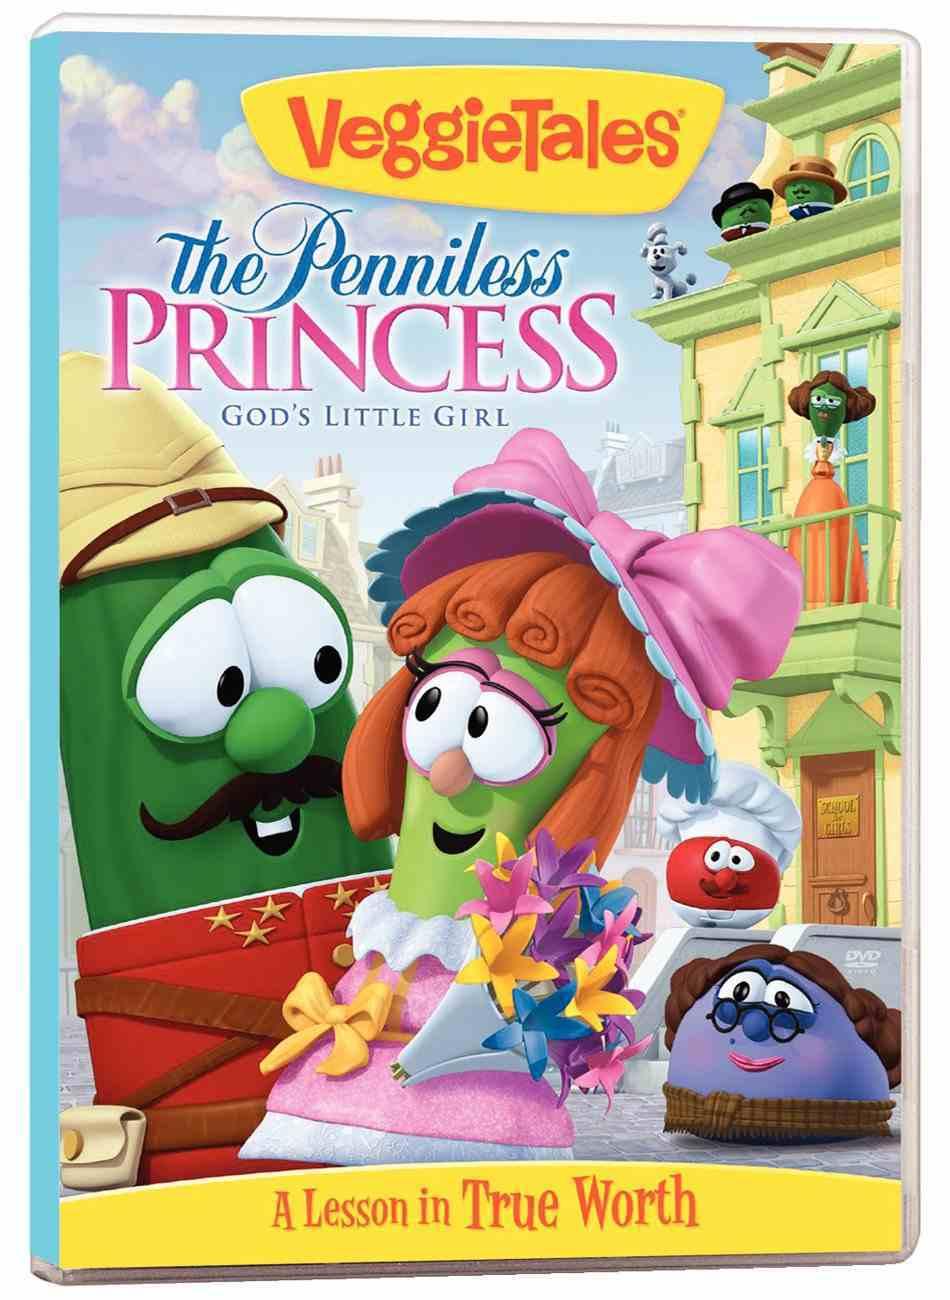 Veggie Tales #49: The Penniless Princess (#049 in Veggie Tales Visual Series (Veggietales)) DVD